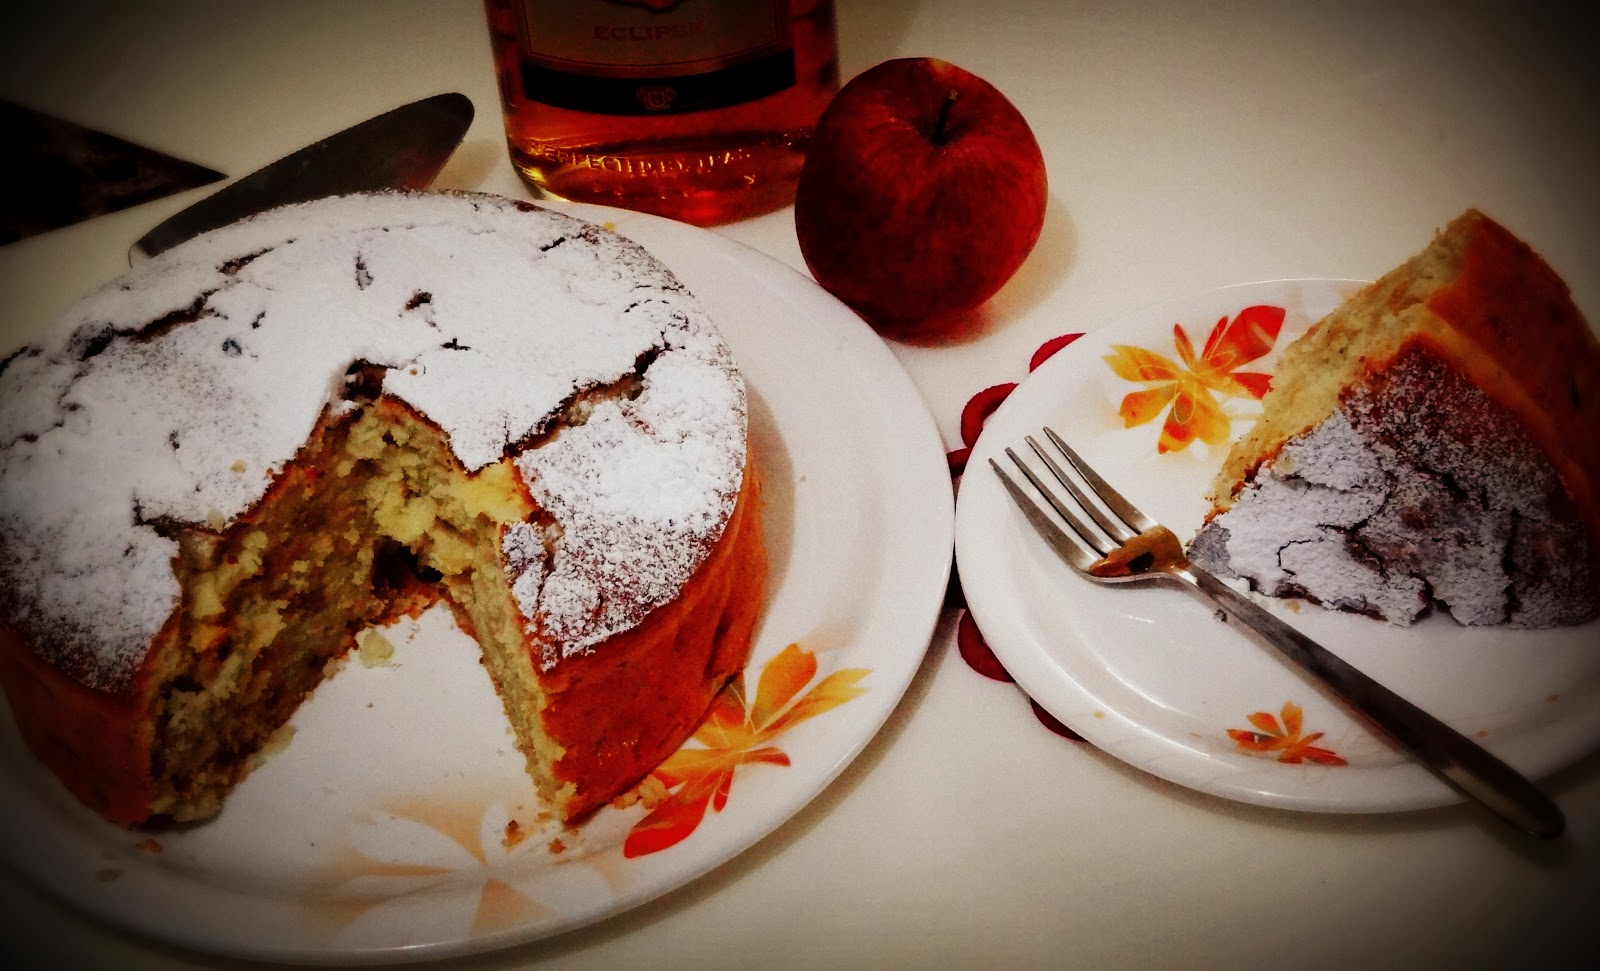 Rum N Raisin cake